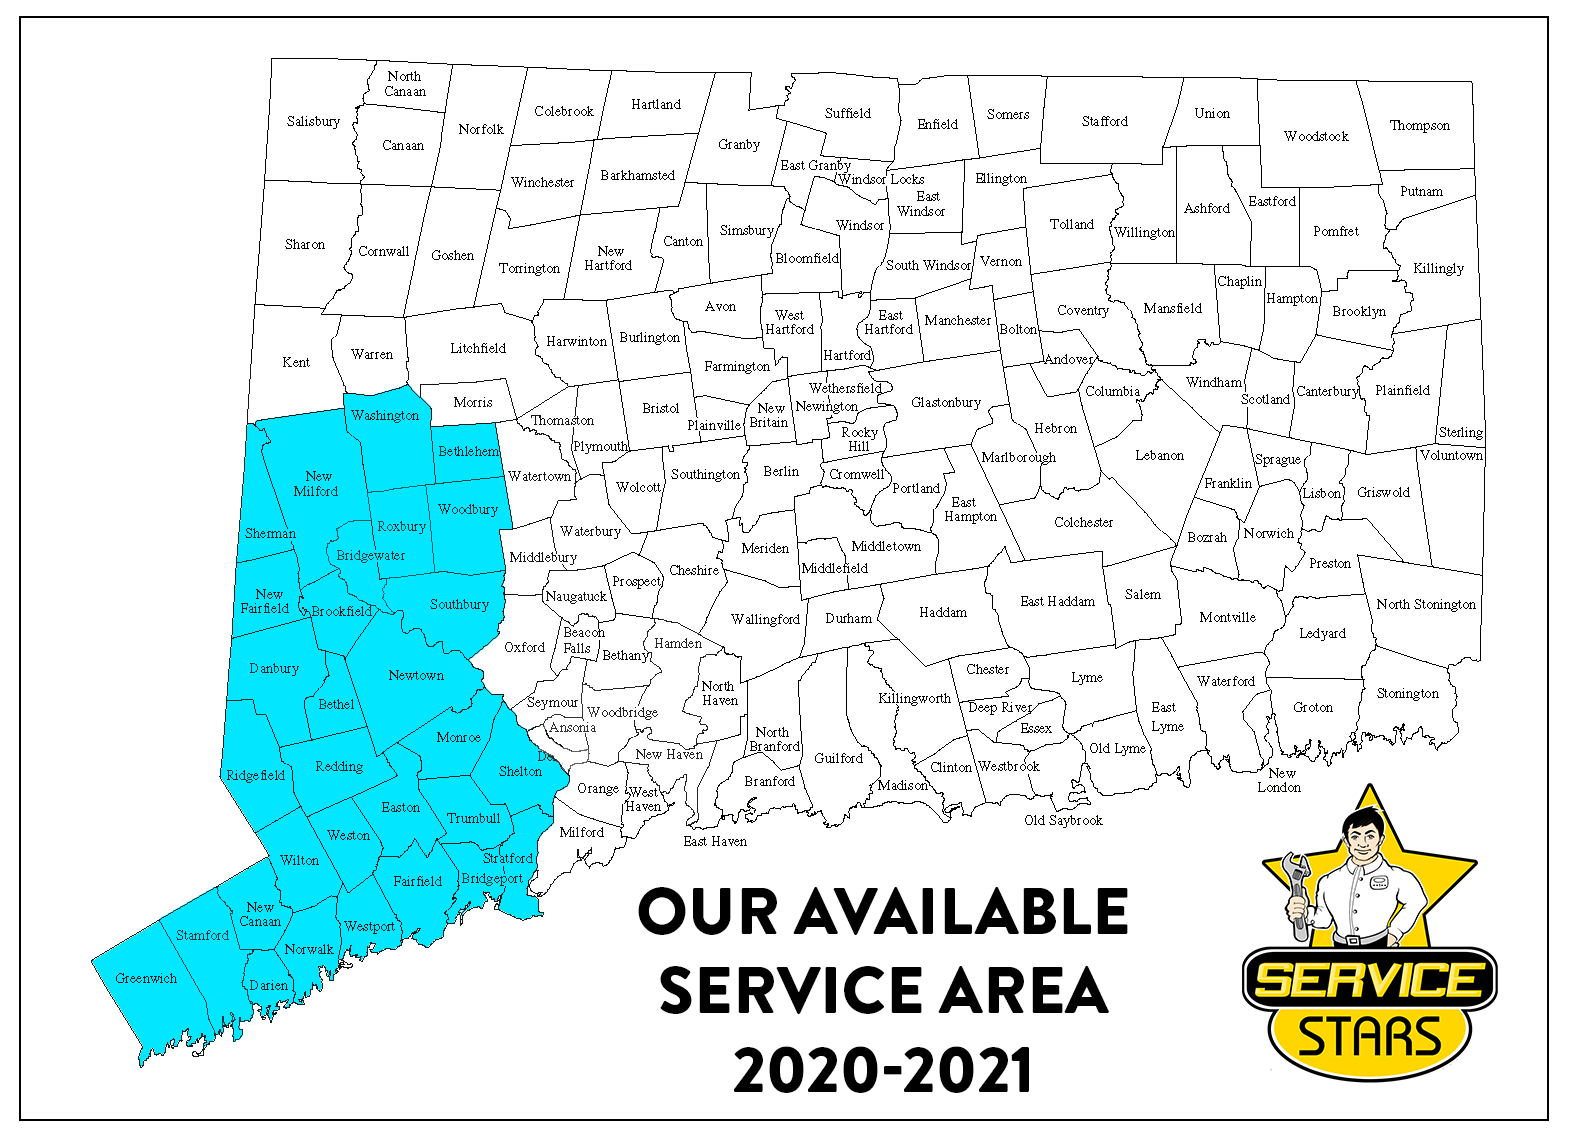 Service Stars - Servicing Area